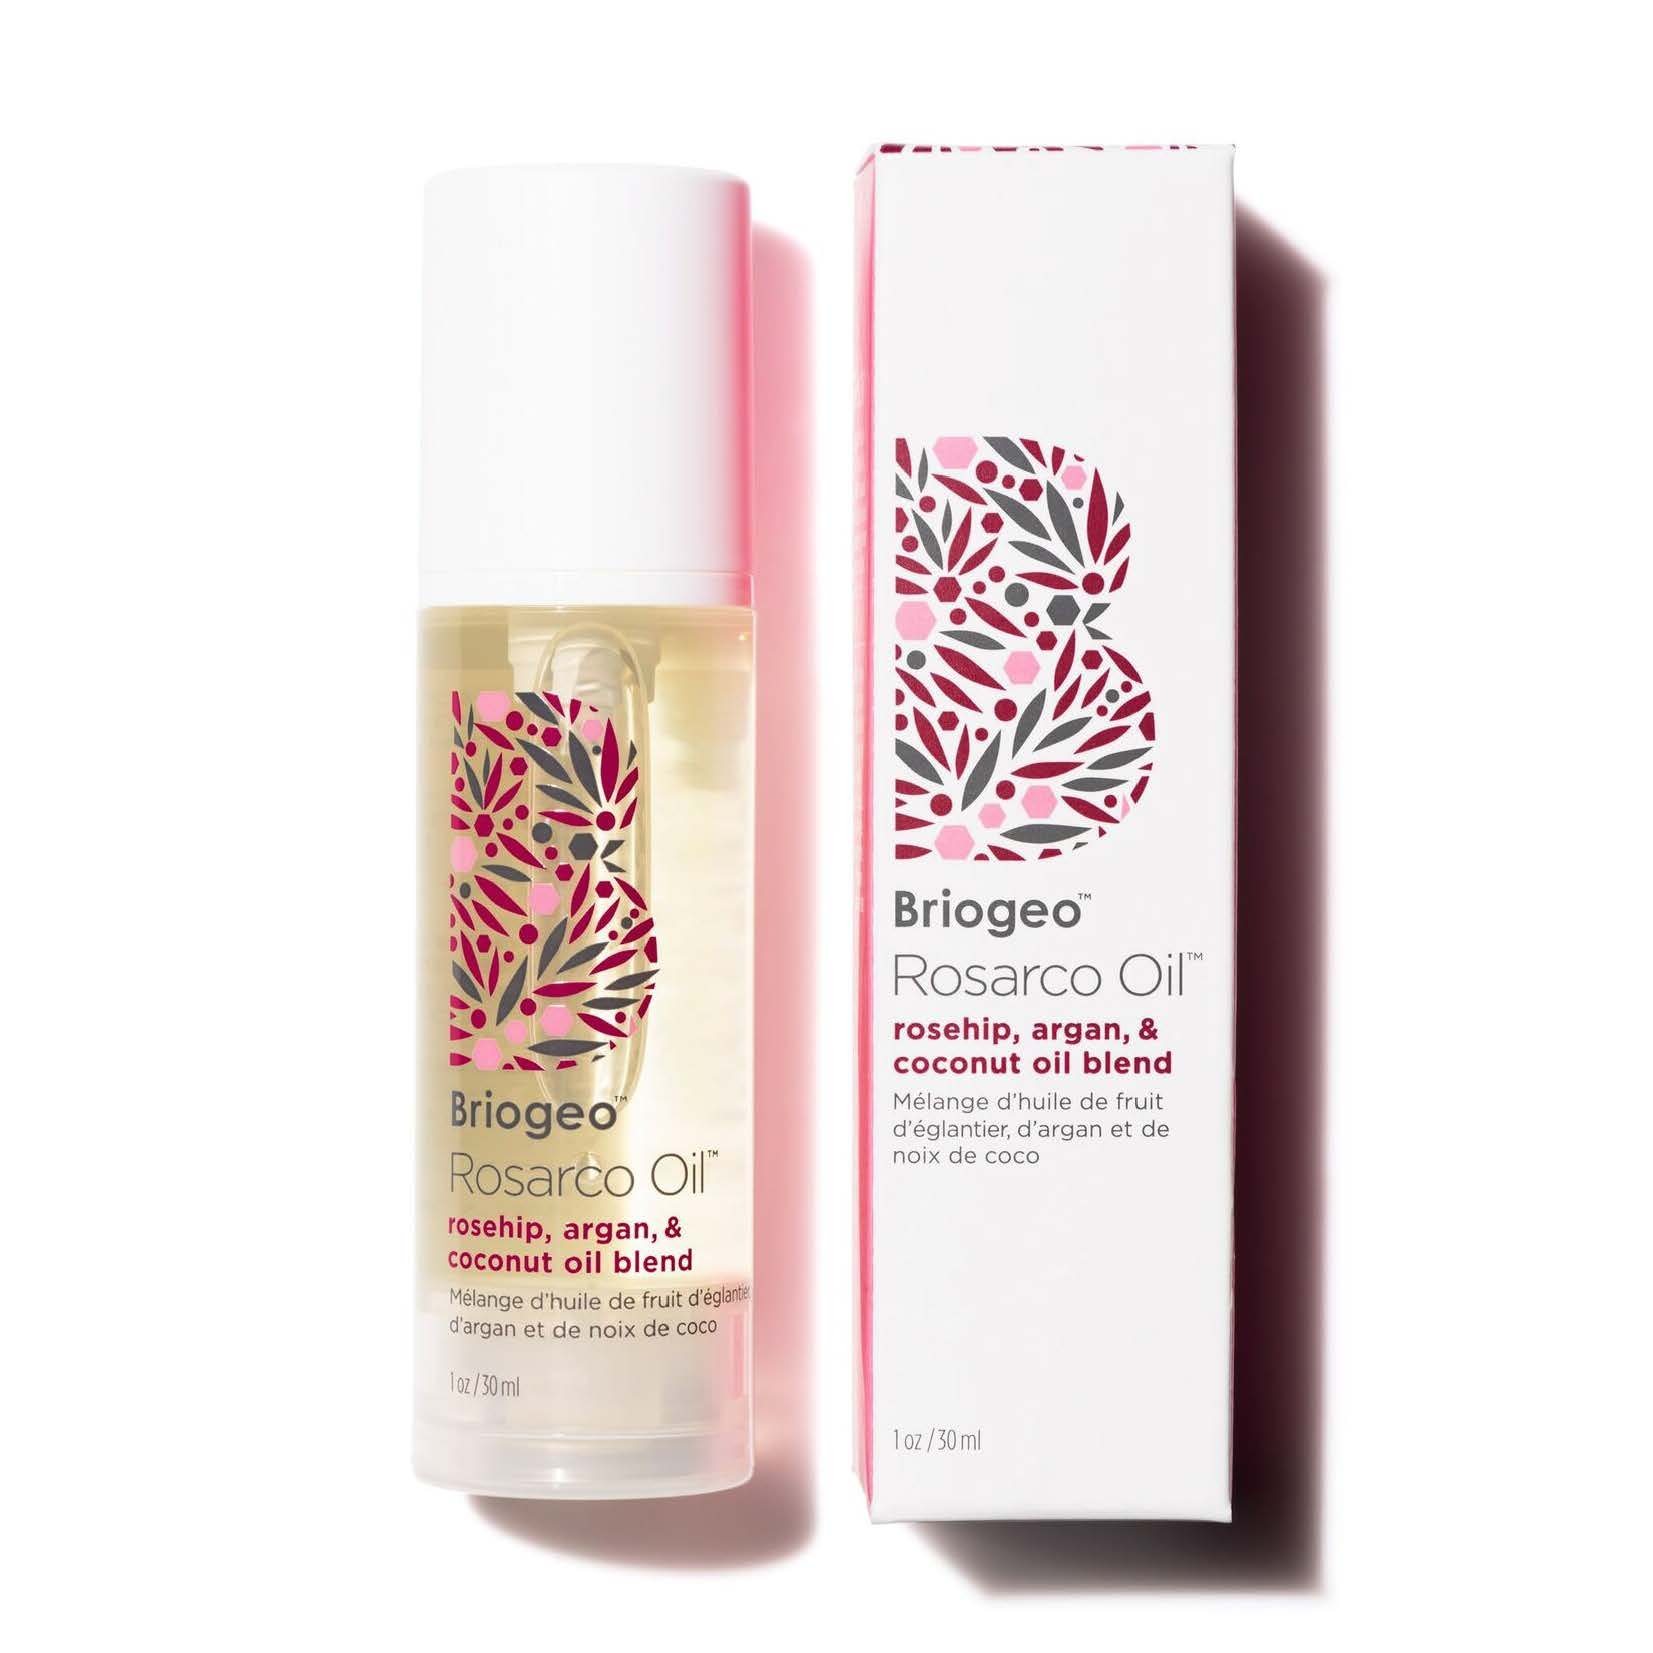 Briogeo - Rosarco Oil, Rosehip, Argan, and Coconut Oil Hair Treatment for Dry, Damaged and Brittle Hair, 1 oz